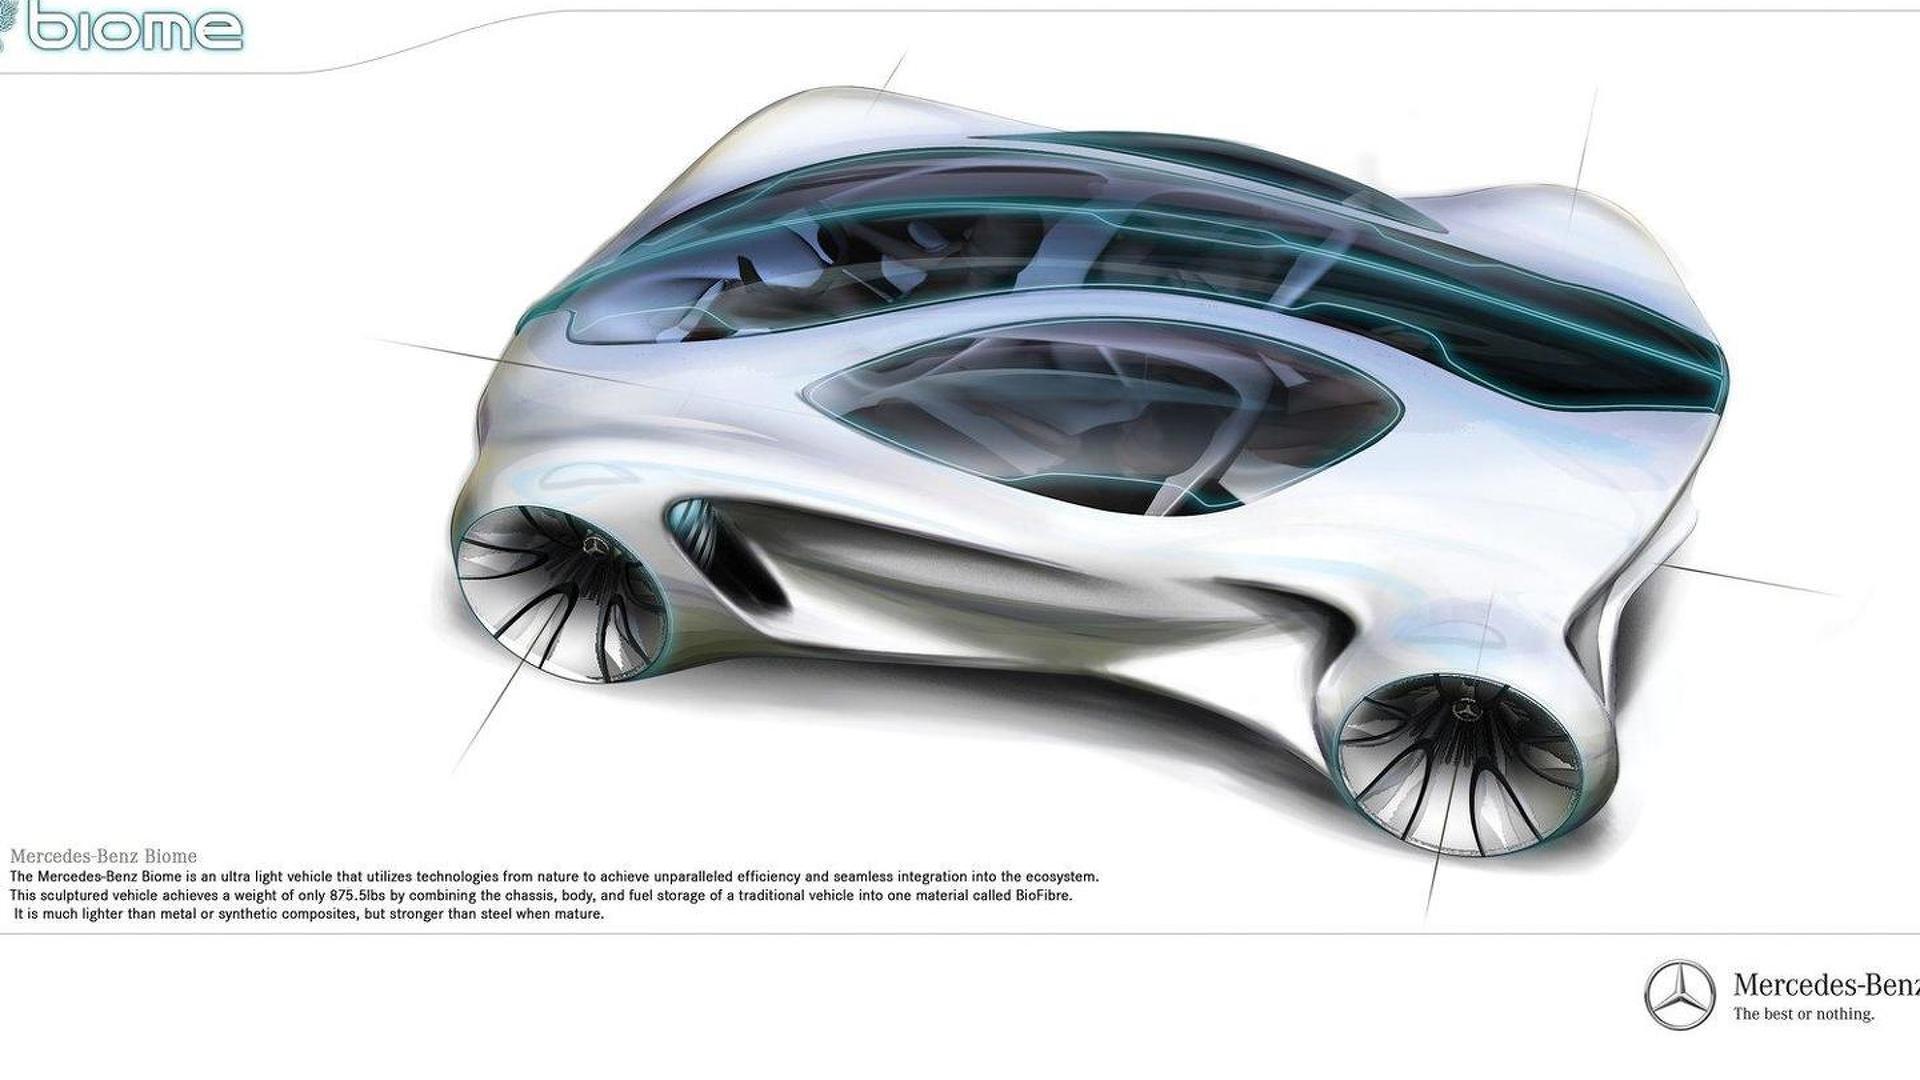 Mercedes Benz Biome Wallpaper Mercedes Benz Biome Concept Gets Built Full  Scale . Mercedes Benz Biome